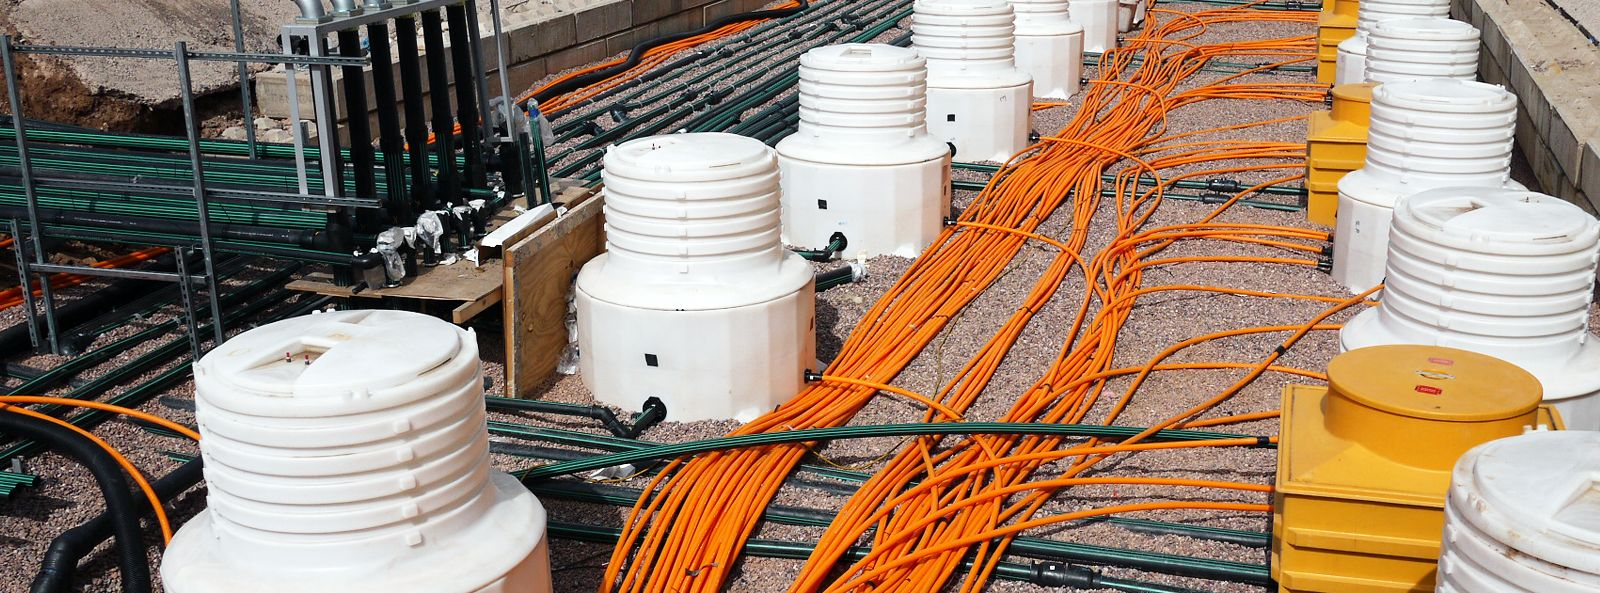 CableTight-EN-Install-Wide.psd